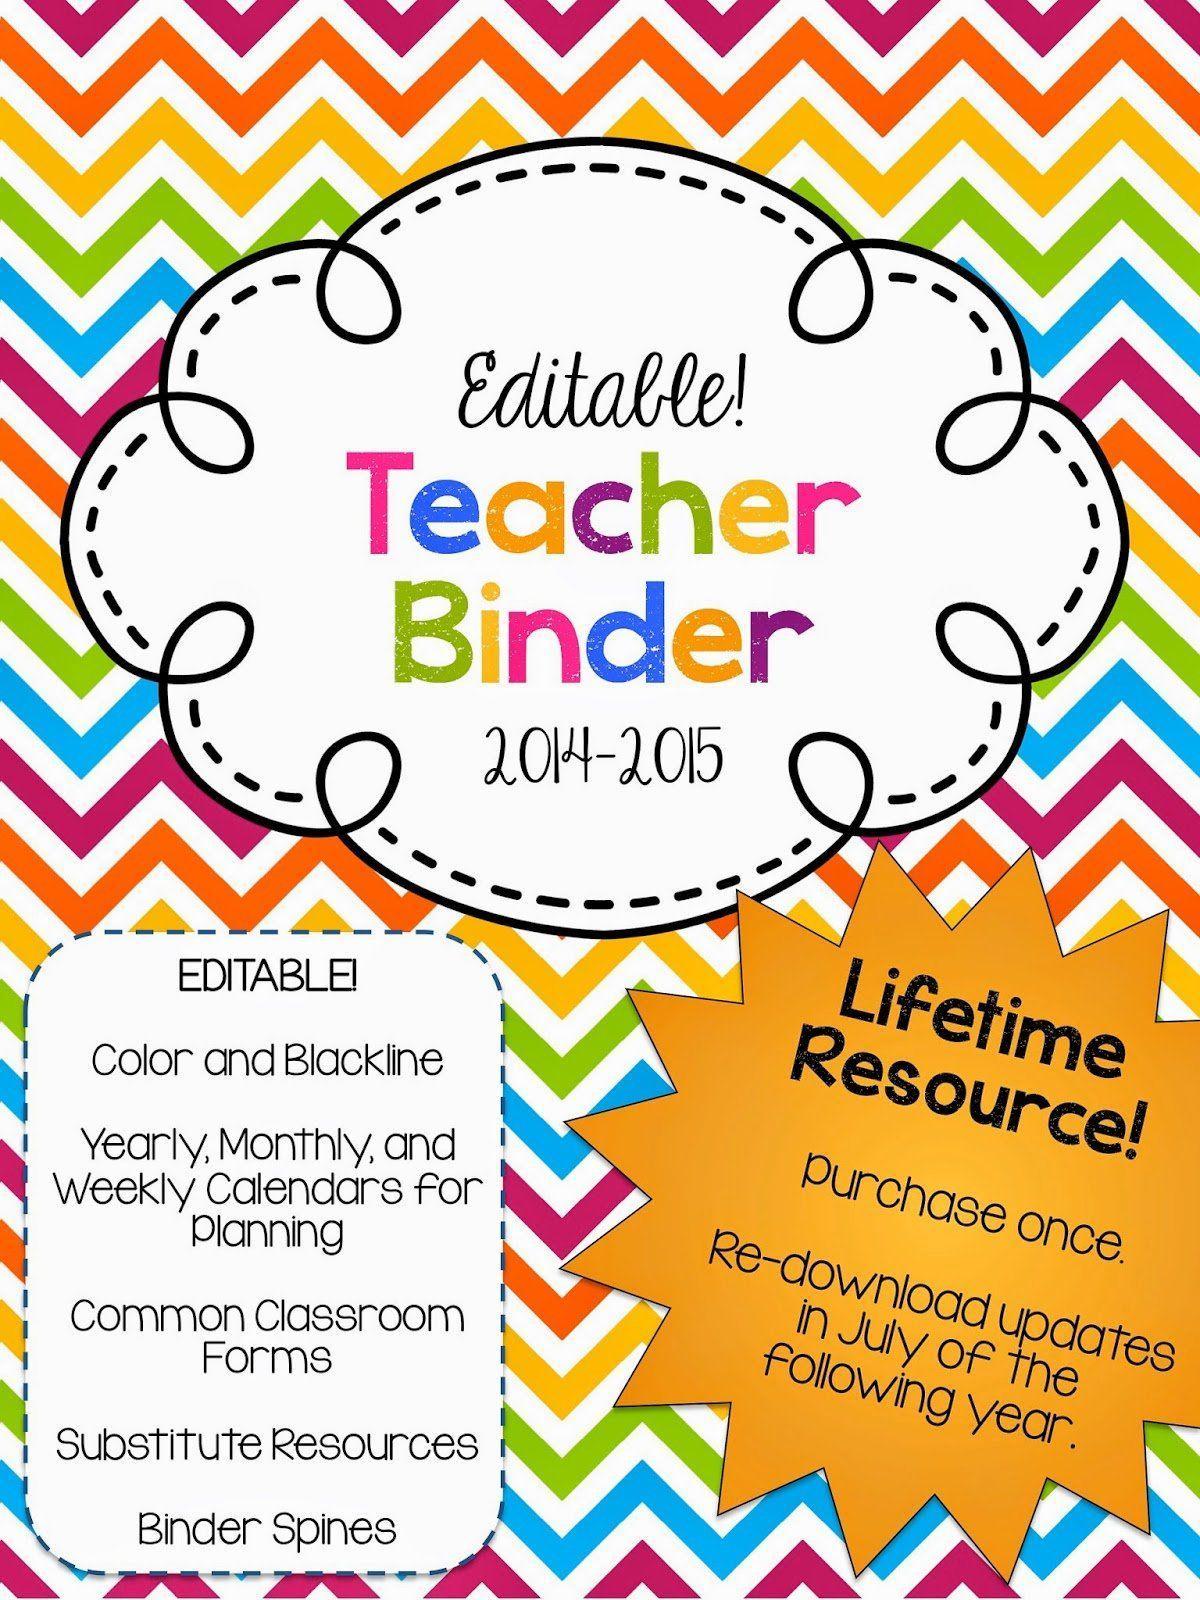 Busty teacher adventures